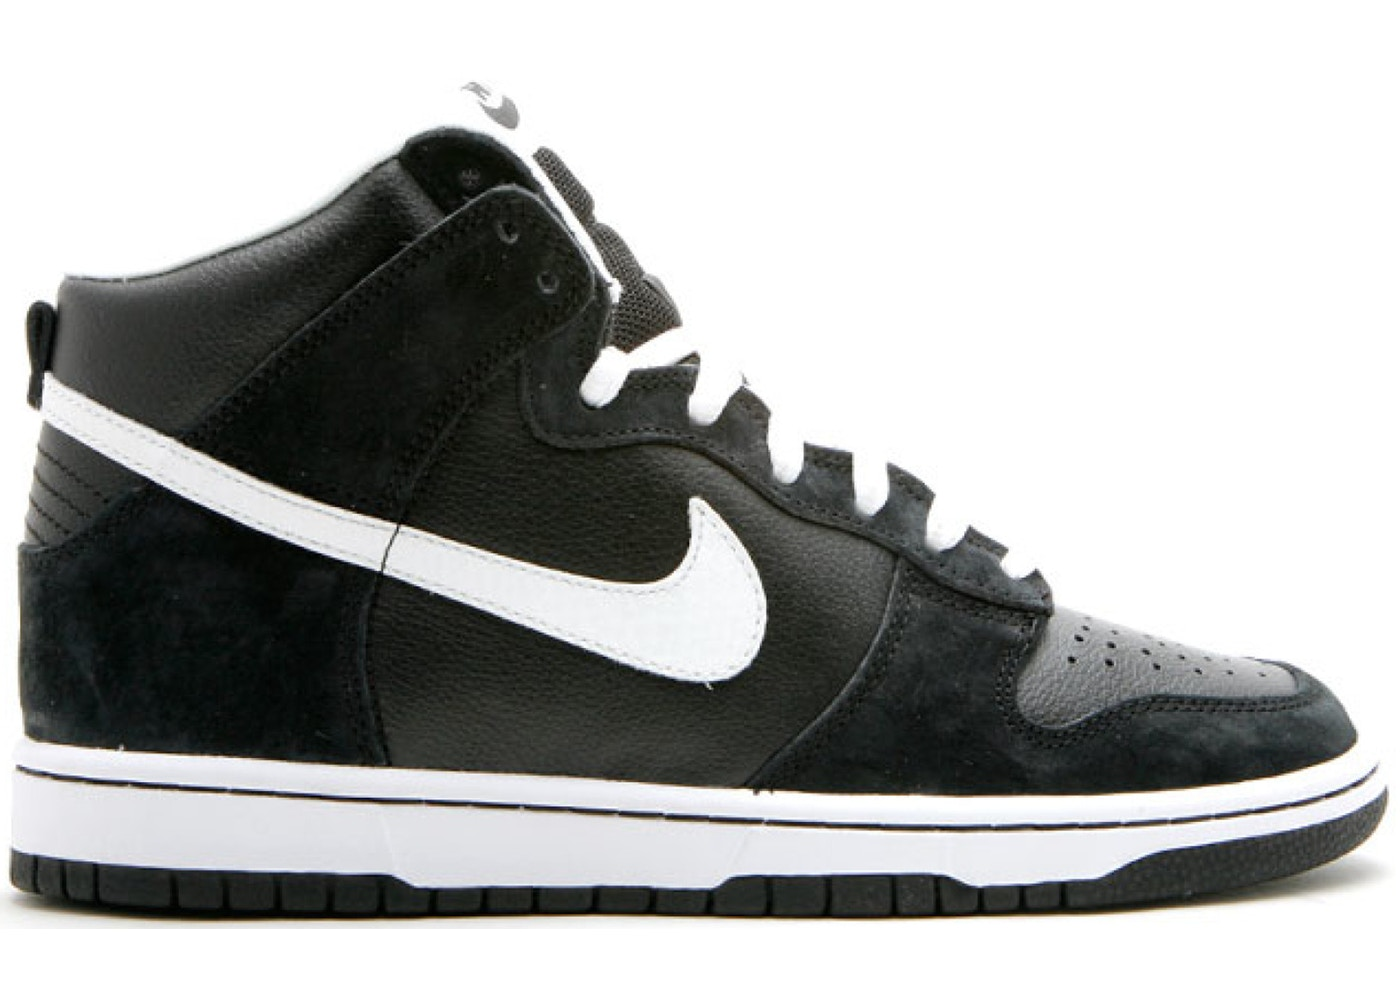 Nike SB Dunk High Venom (2008)